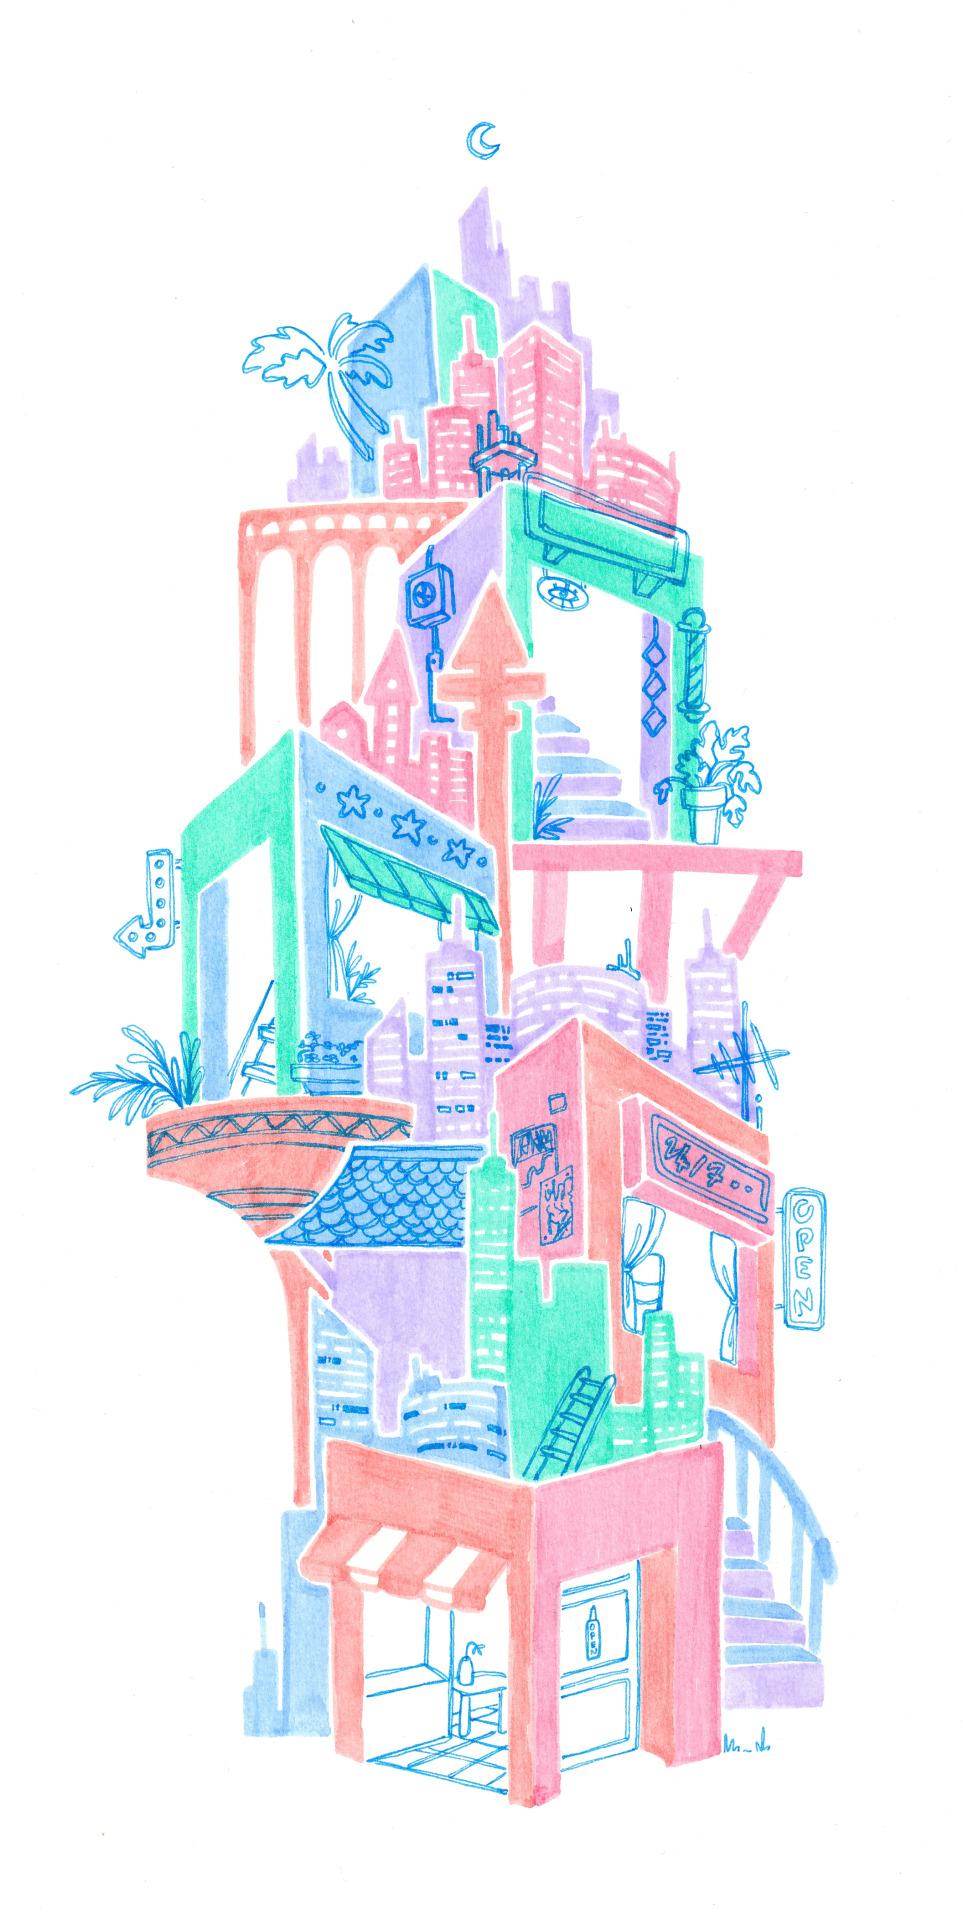 🌴 🌙 🦩 cityscape   🦩 🌙 🌴 #artists on tumblr #pastel art#pastel aesthetic#lovecore#vaporwave#neon signs#city#building#skyline#colorblock #fine liner art #plants#softcore#kawaii